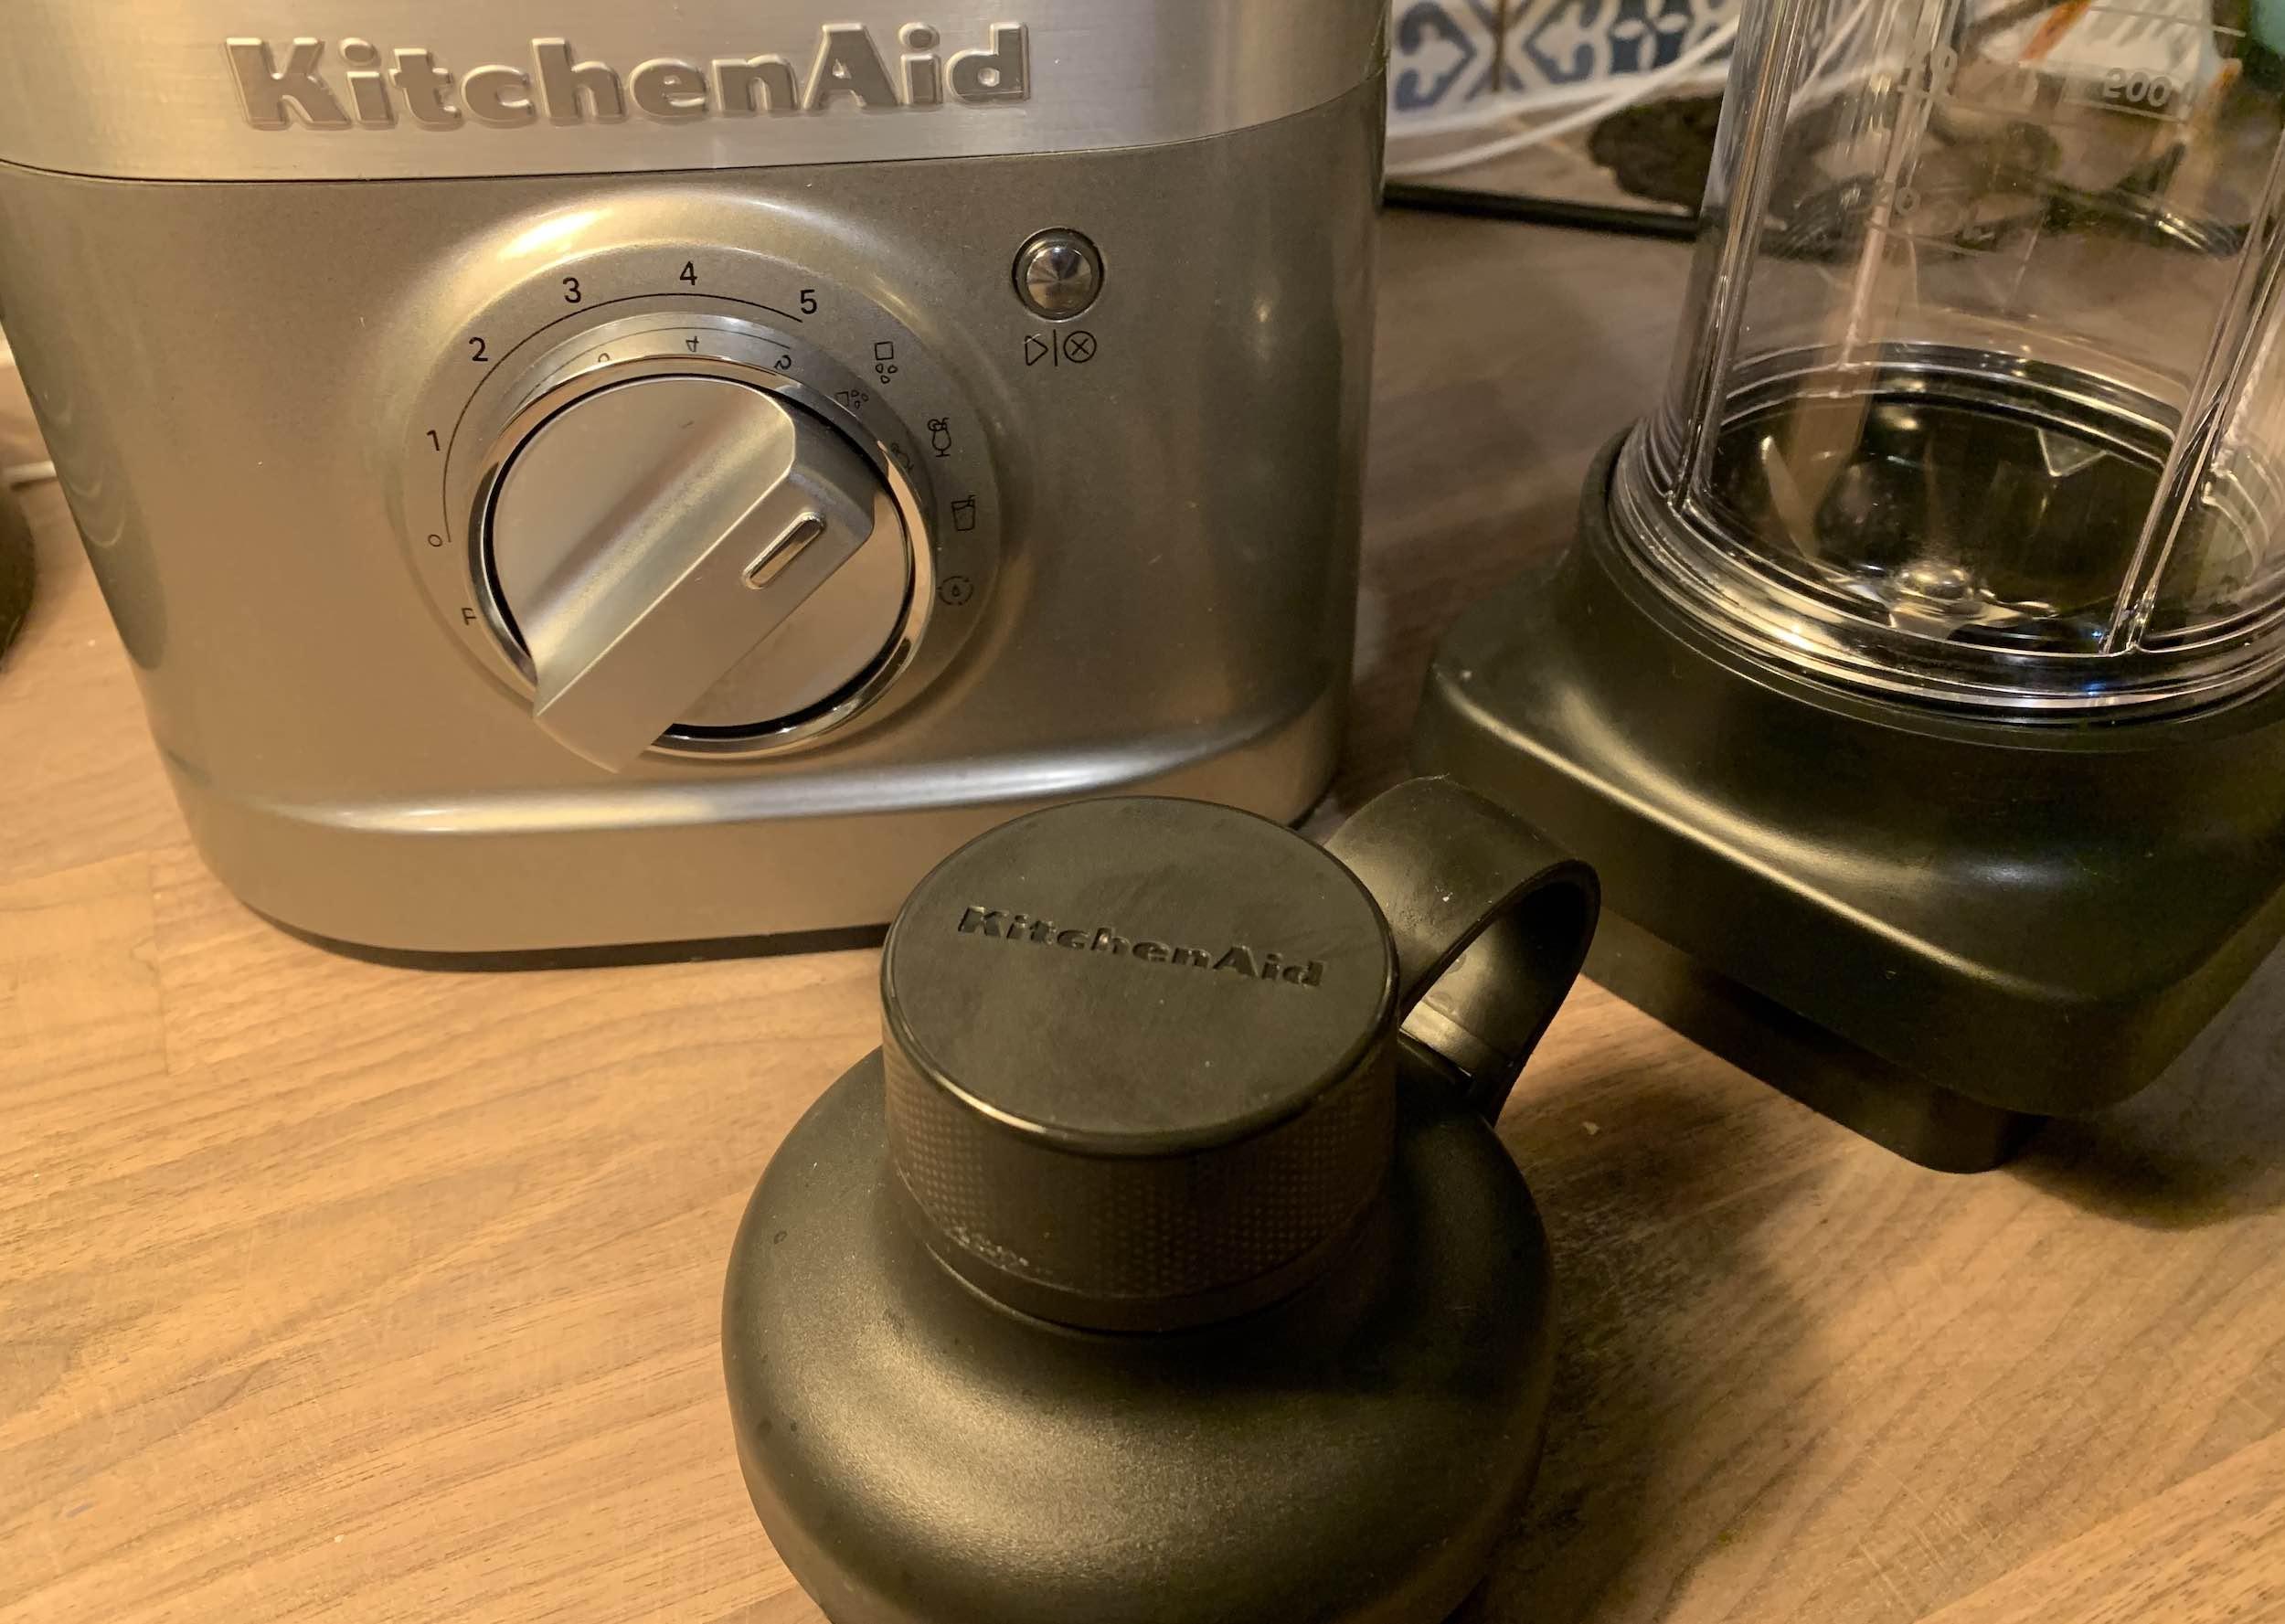 Personal blending cup kitchenaid k400 copy